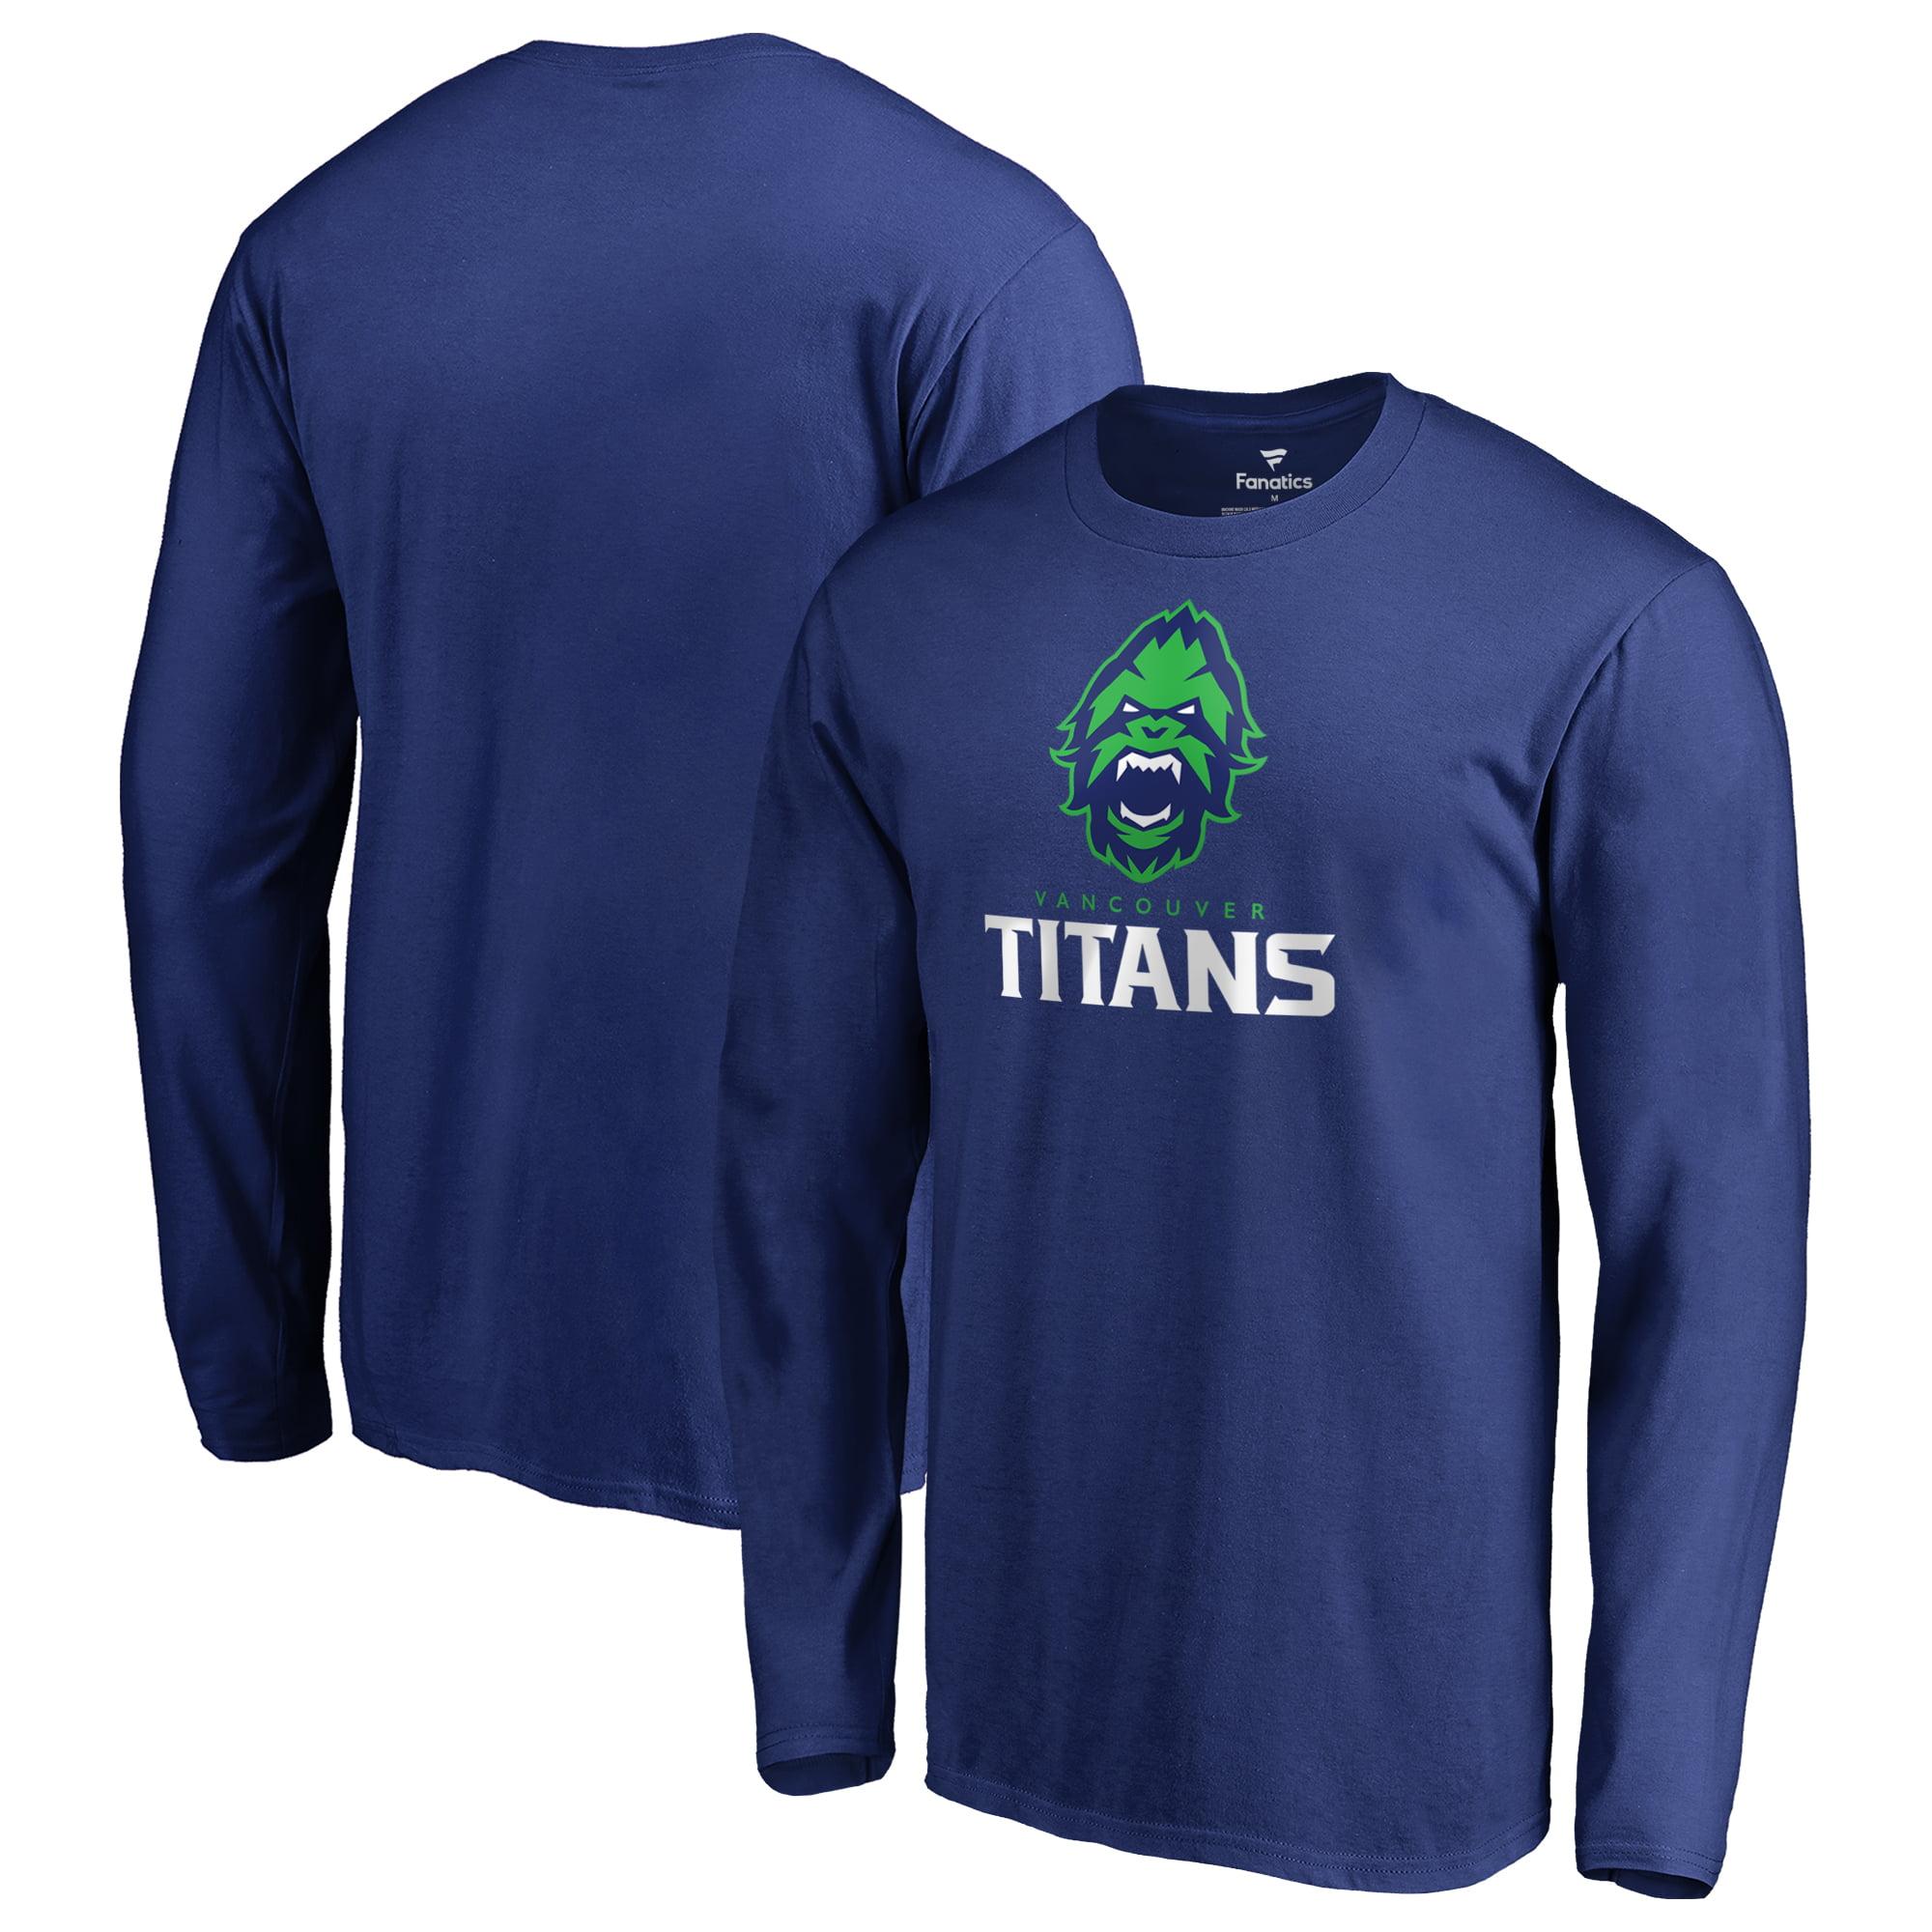 Vancouver Titans Fanatics Branded Team Identity Long Sleeve T-Shirt - Royal